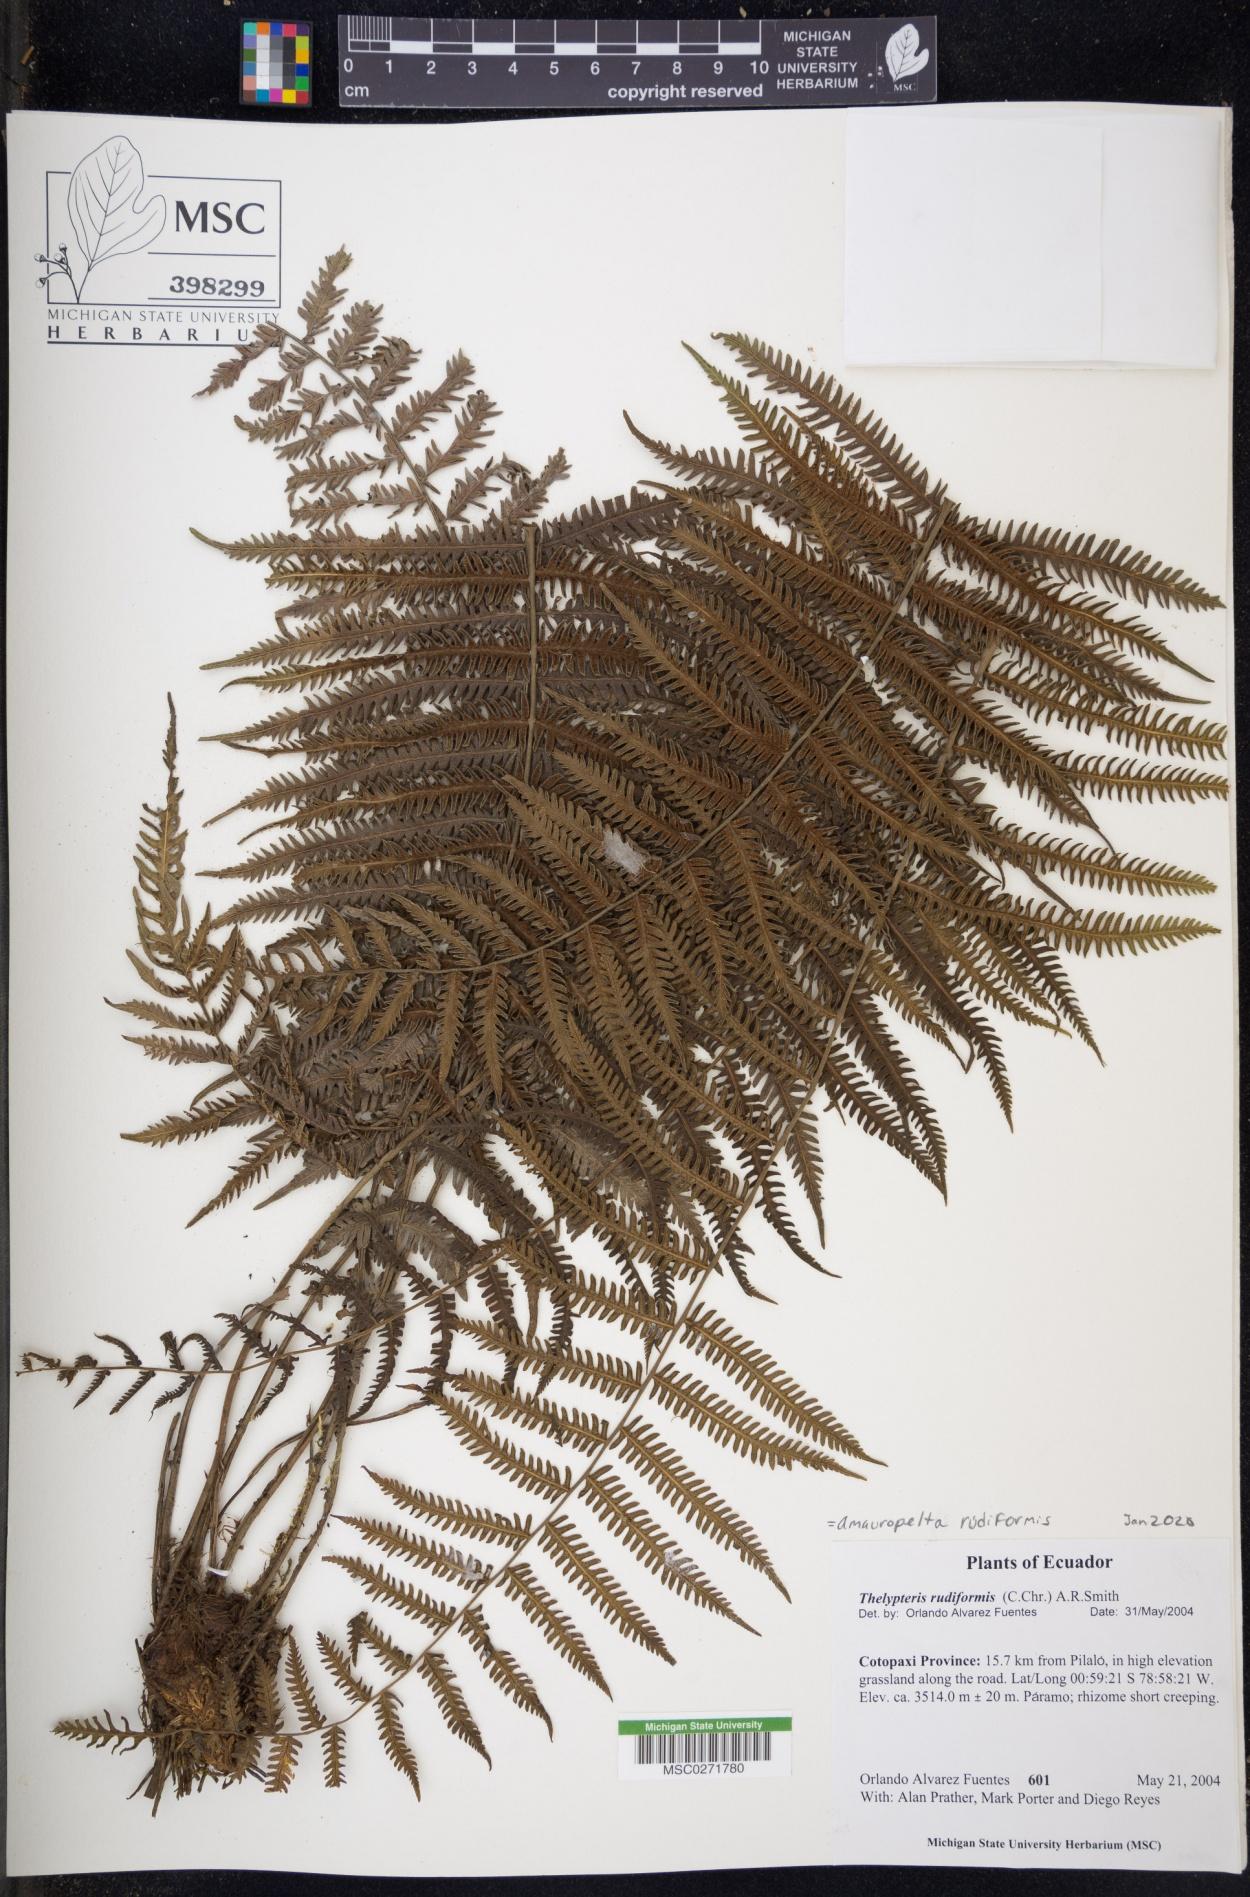 Amauropelta rudiformis image